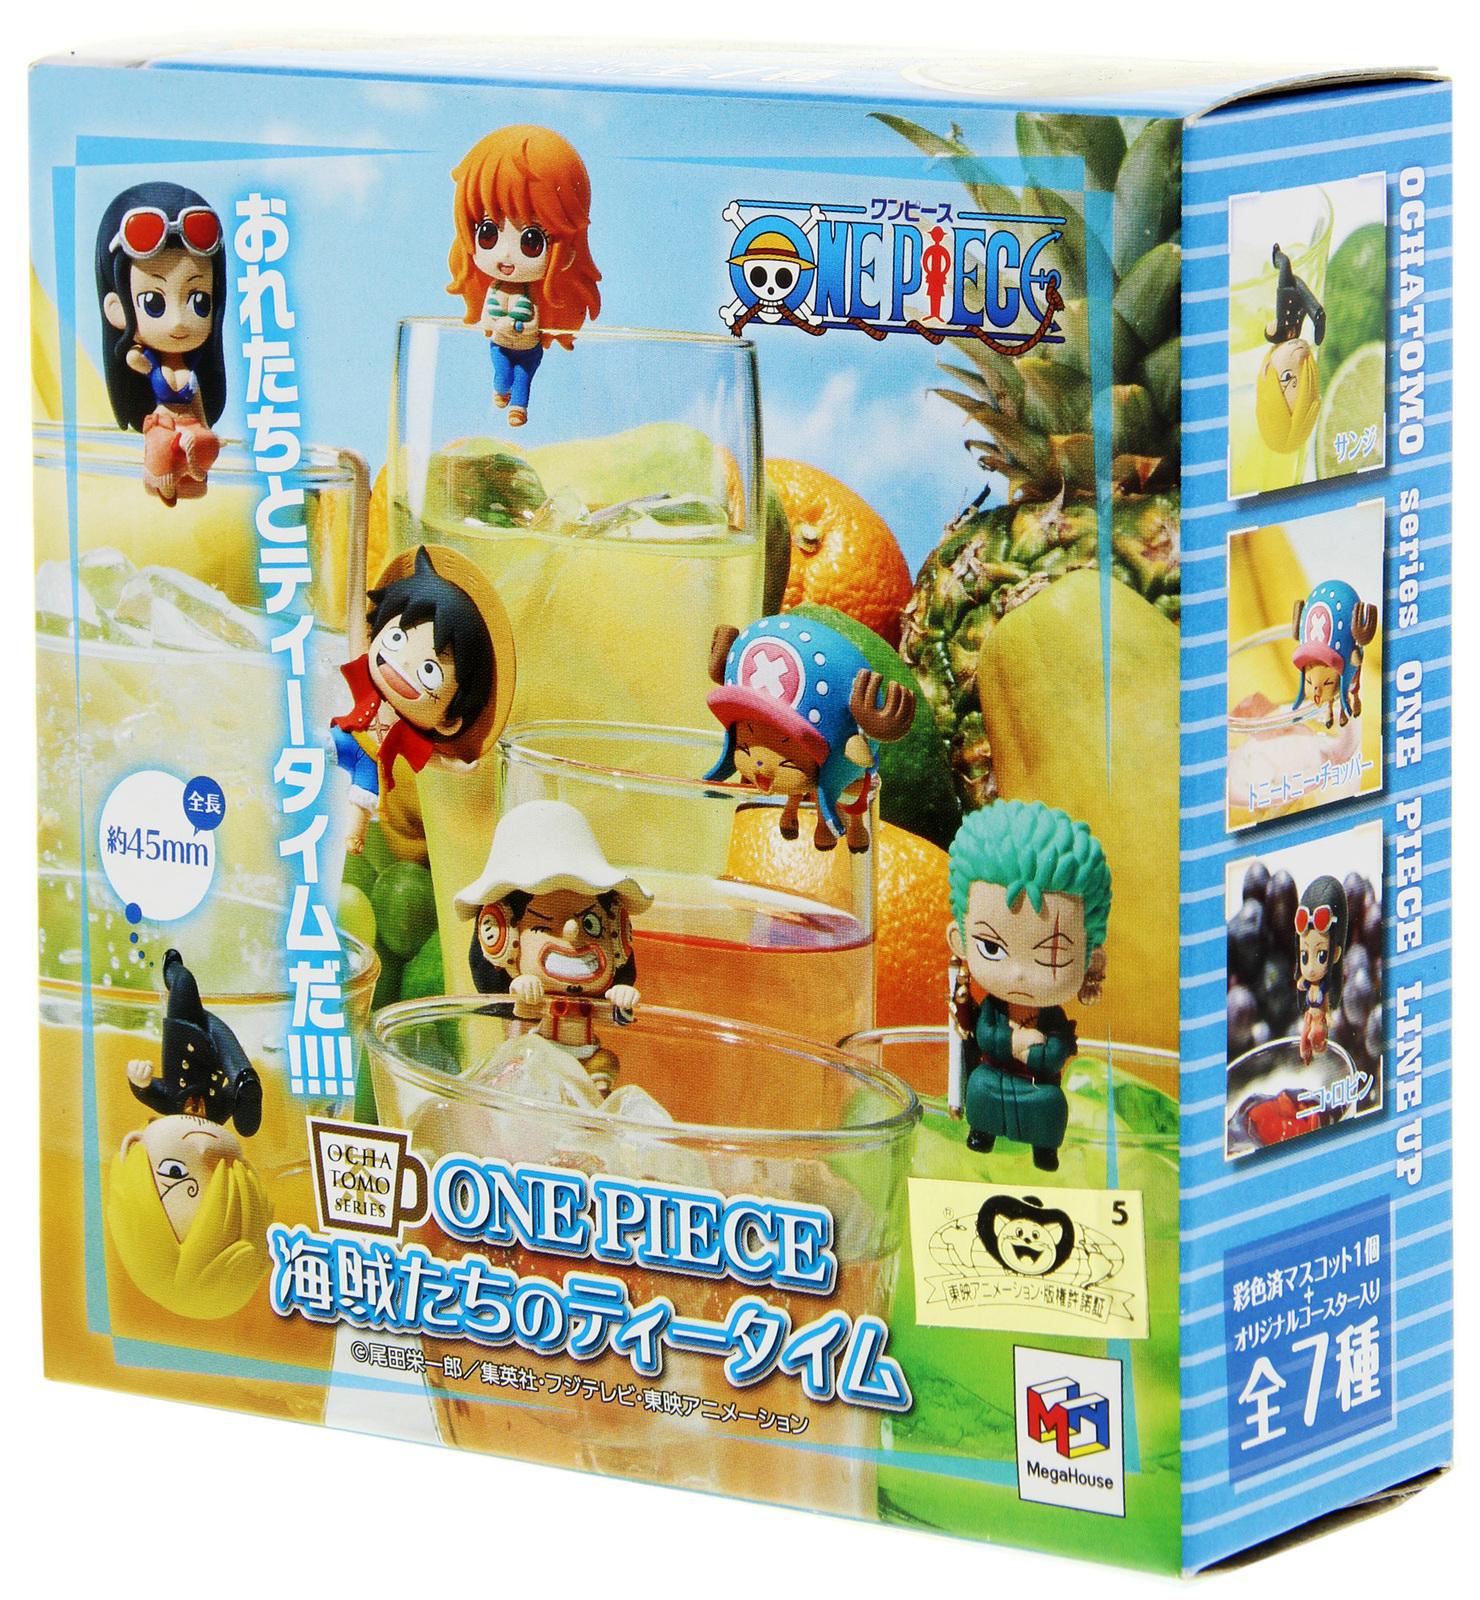 One Piece Ochatomo Series Tea Time Blind Box At Mighty Ape Nz